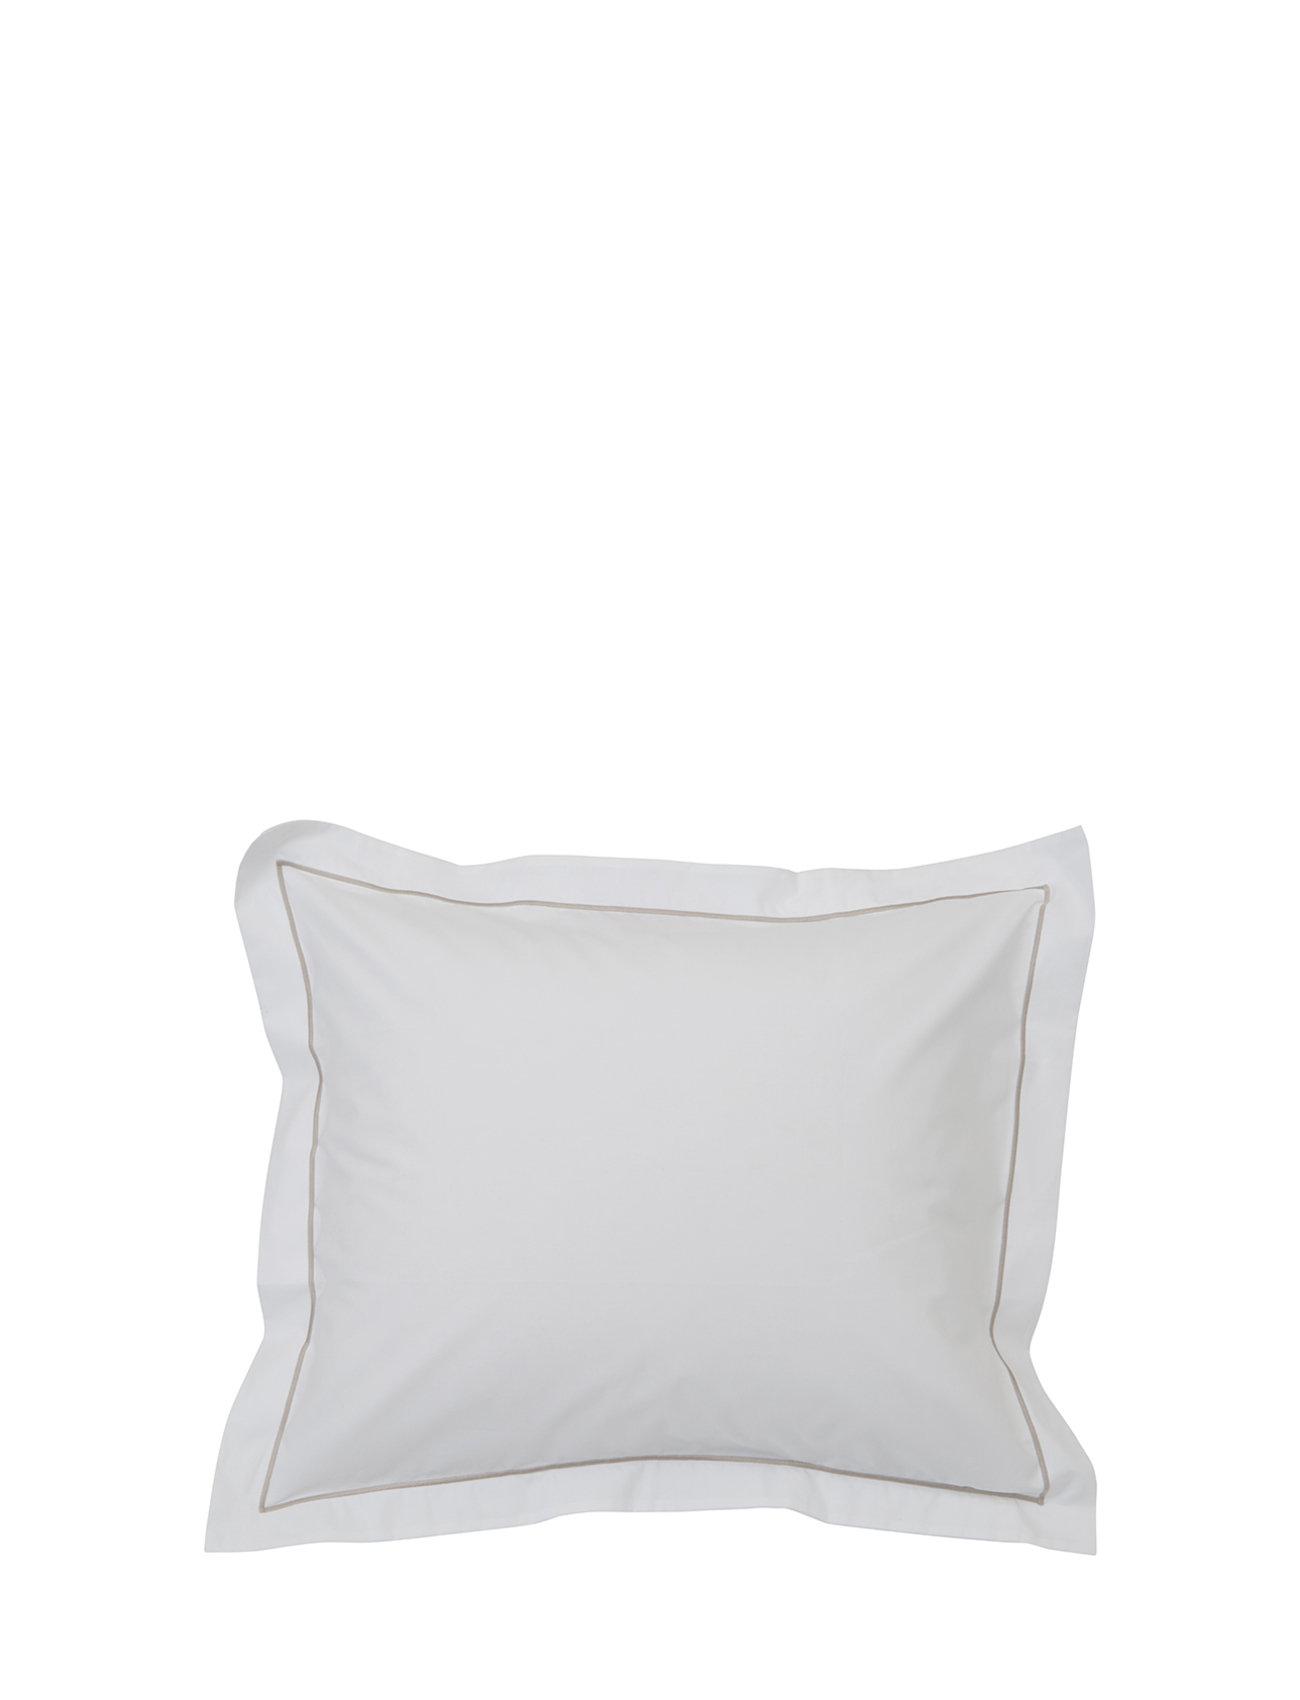 Lexington Home Hotel Percale White/Lt Beige Pillowcase - WHITE/LT BEIGE